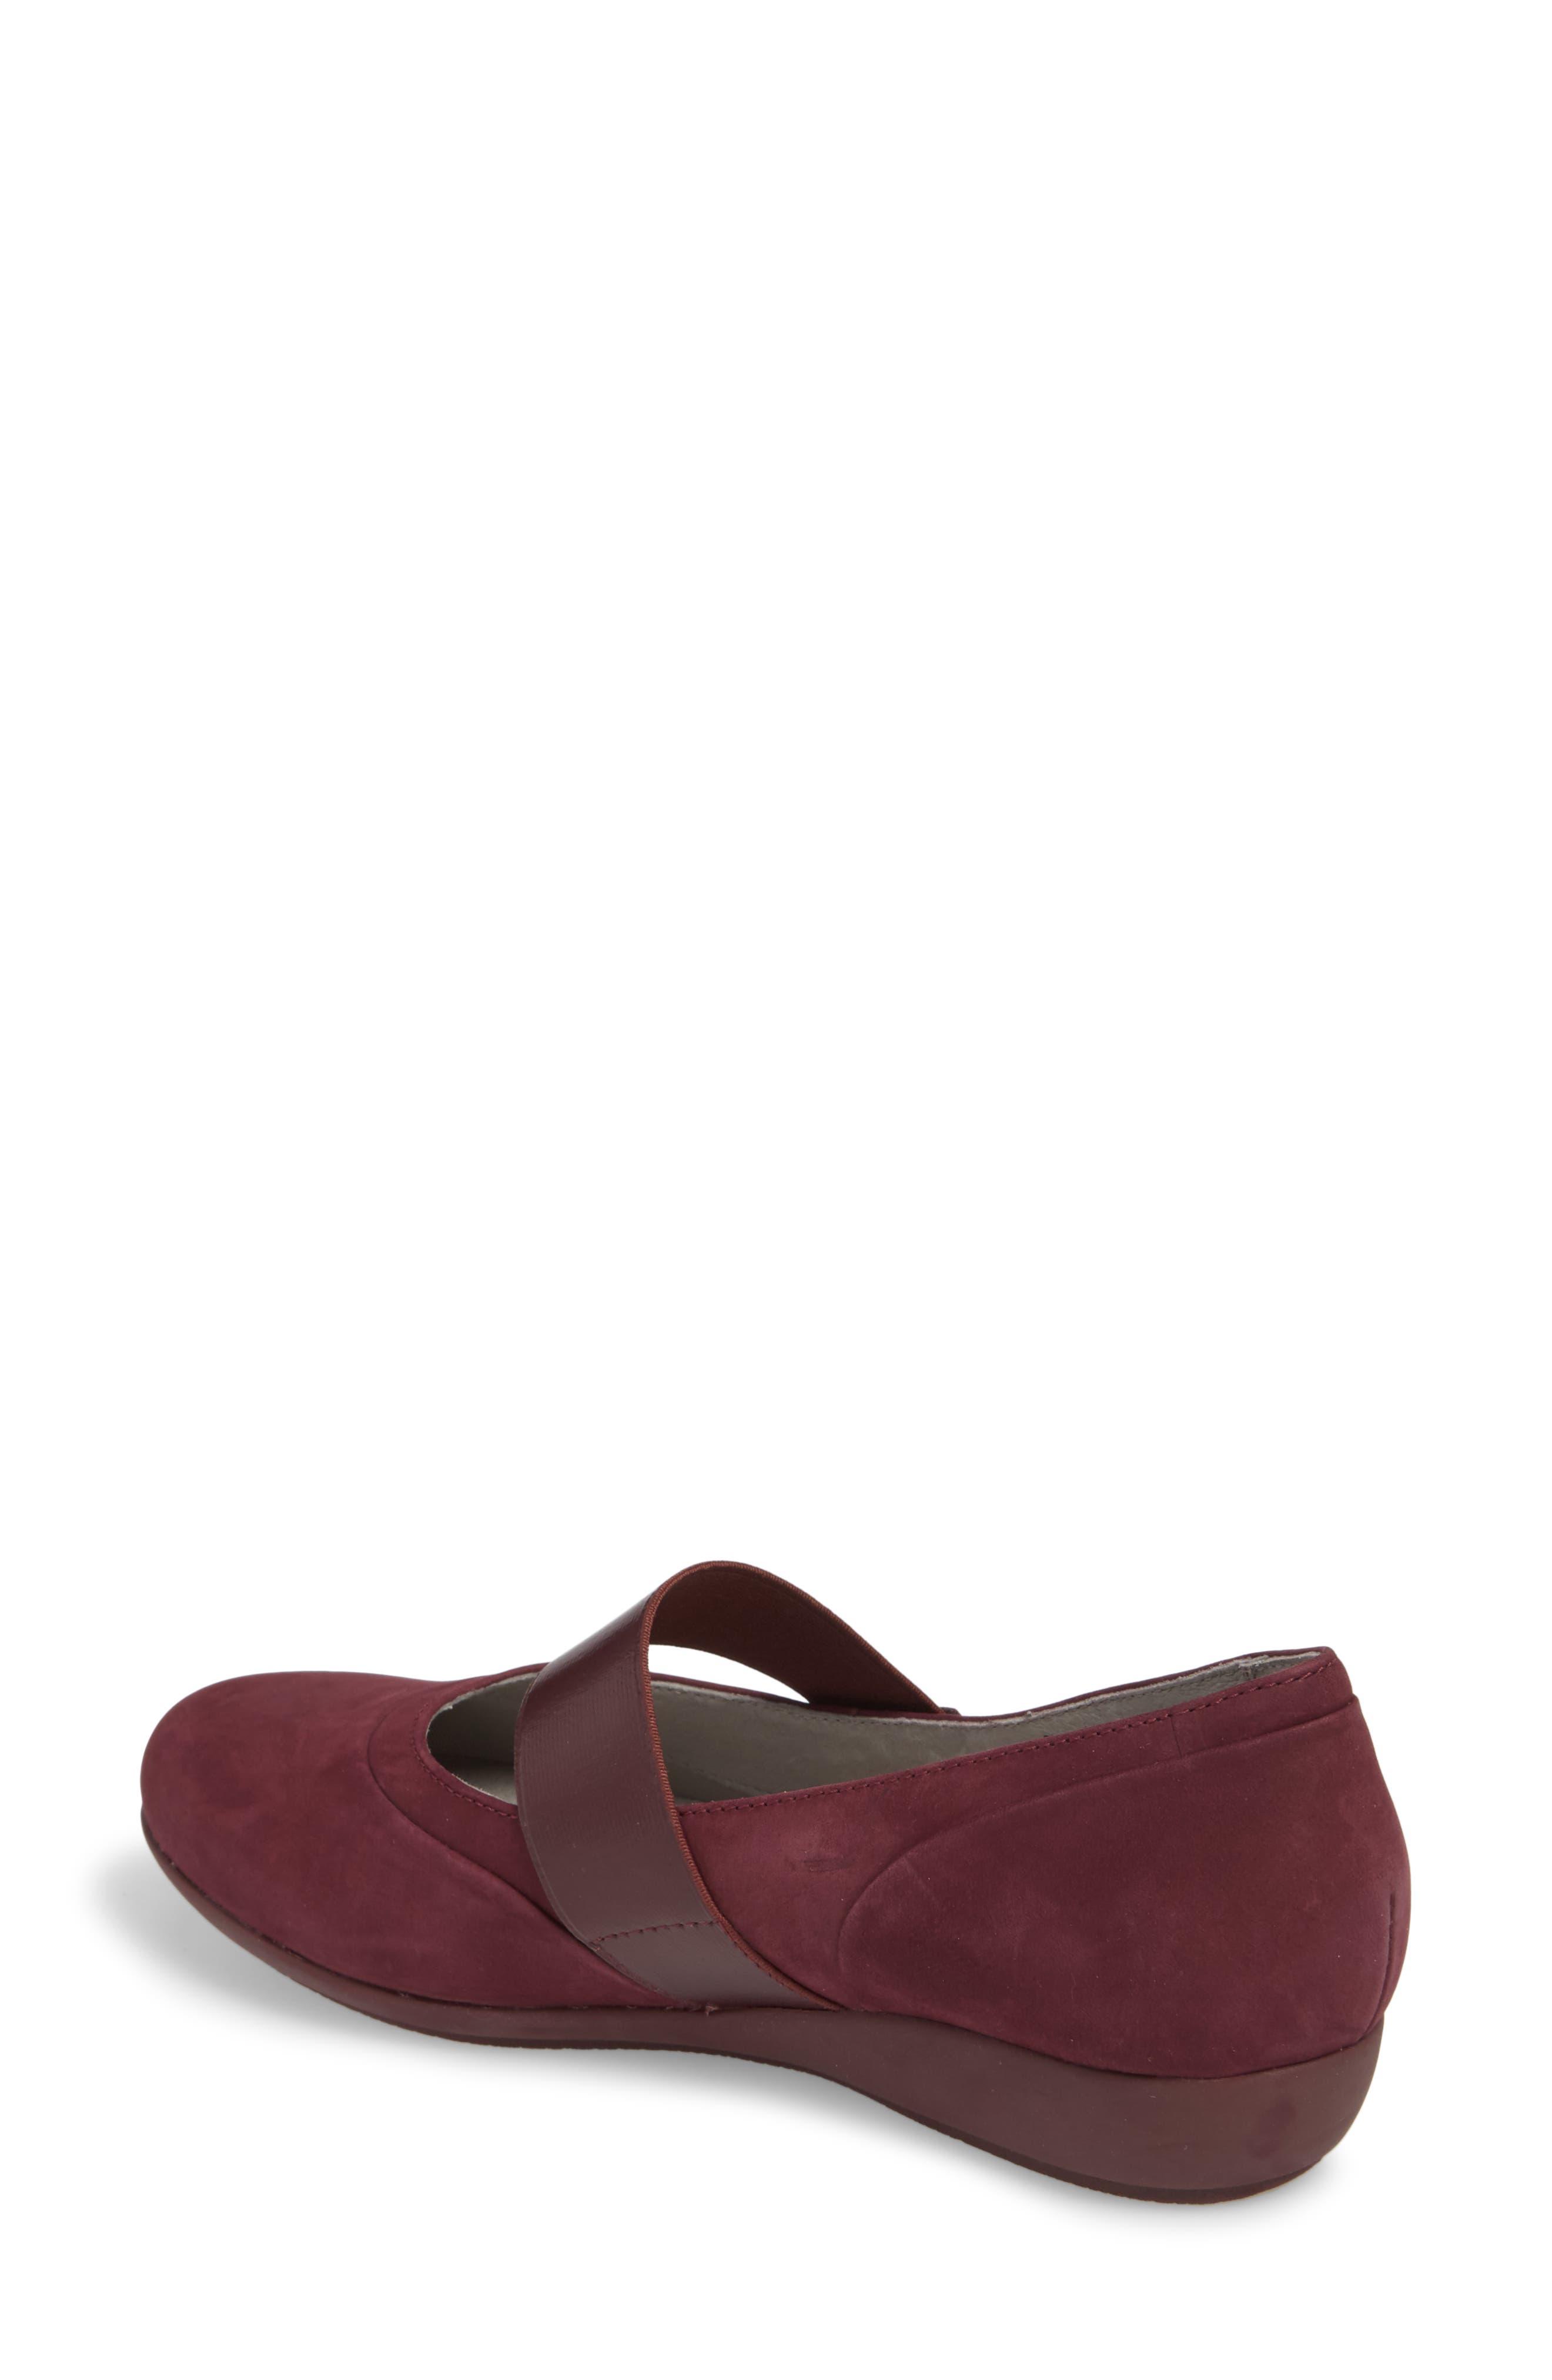 Kendra Mary Jane Wedge,                             Alternate thumbnail 2, color,                             Wine Milled Nubuck Leather